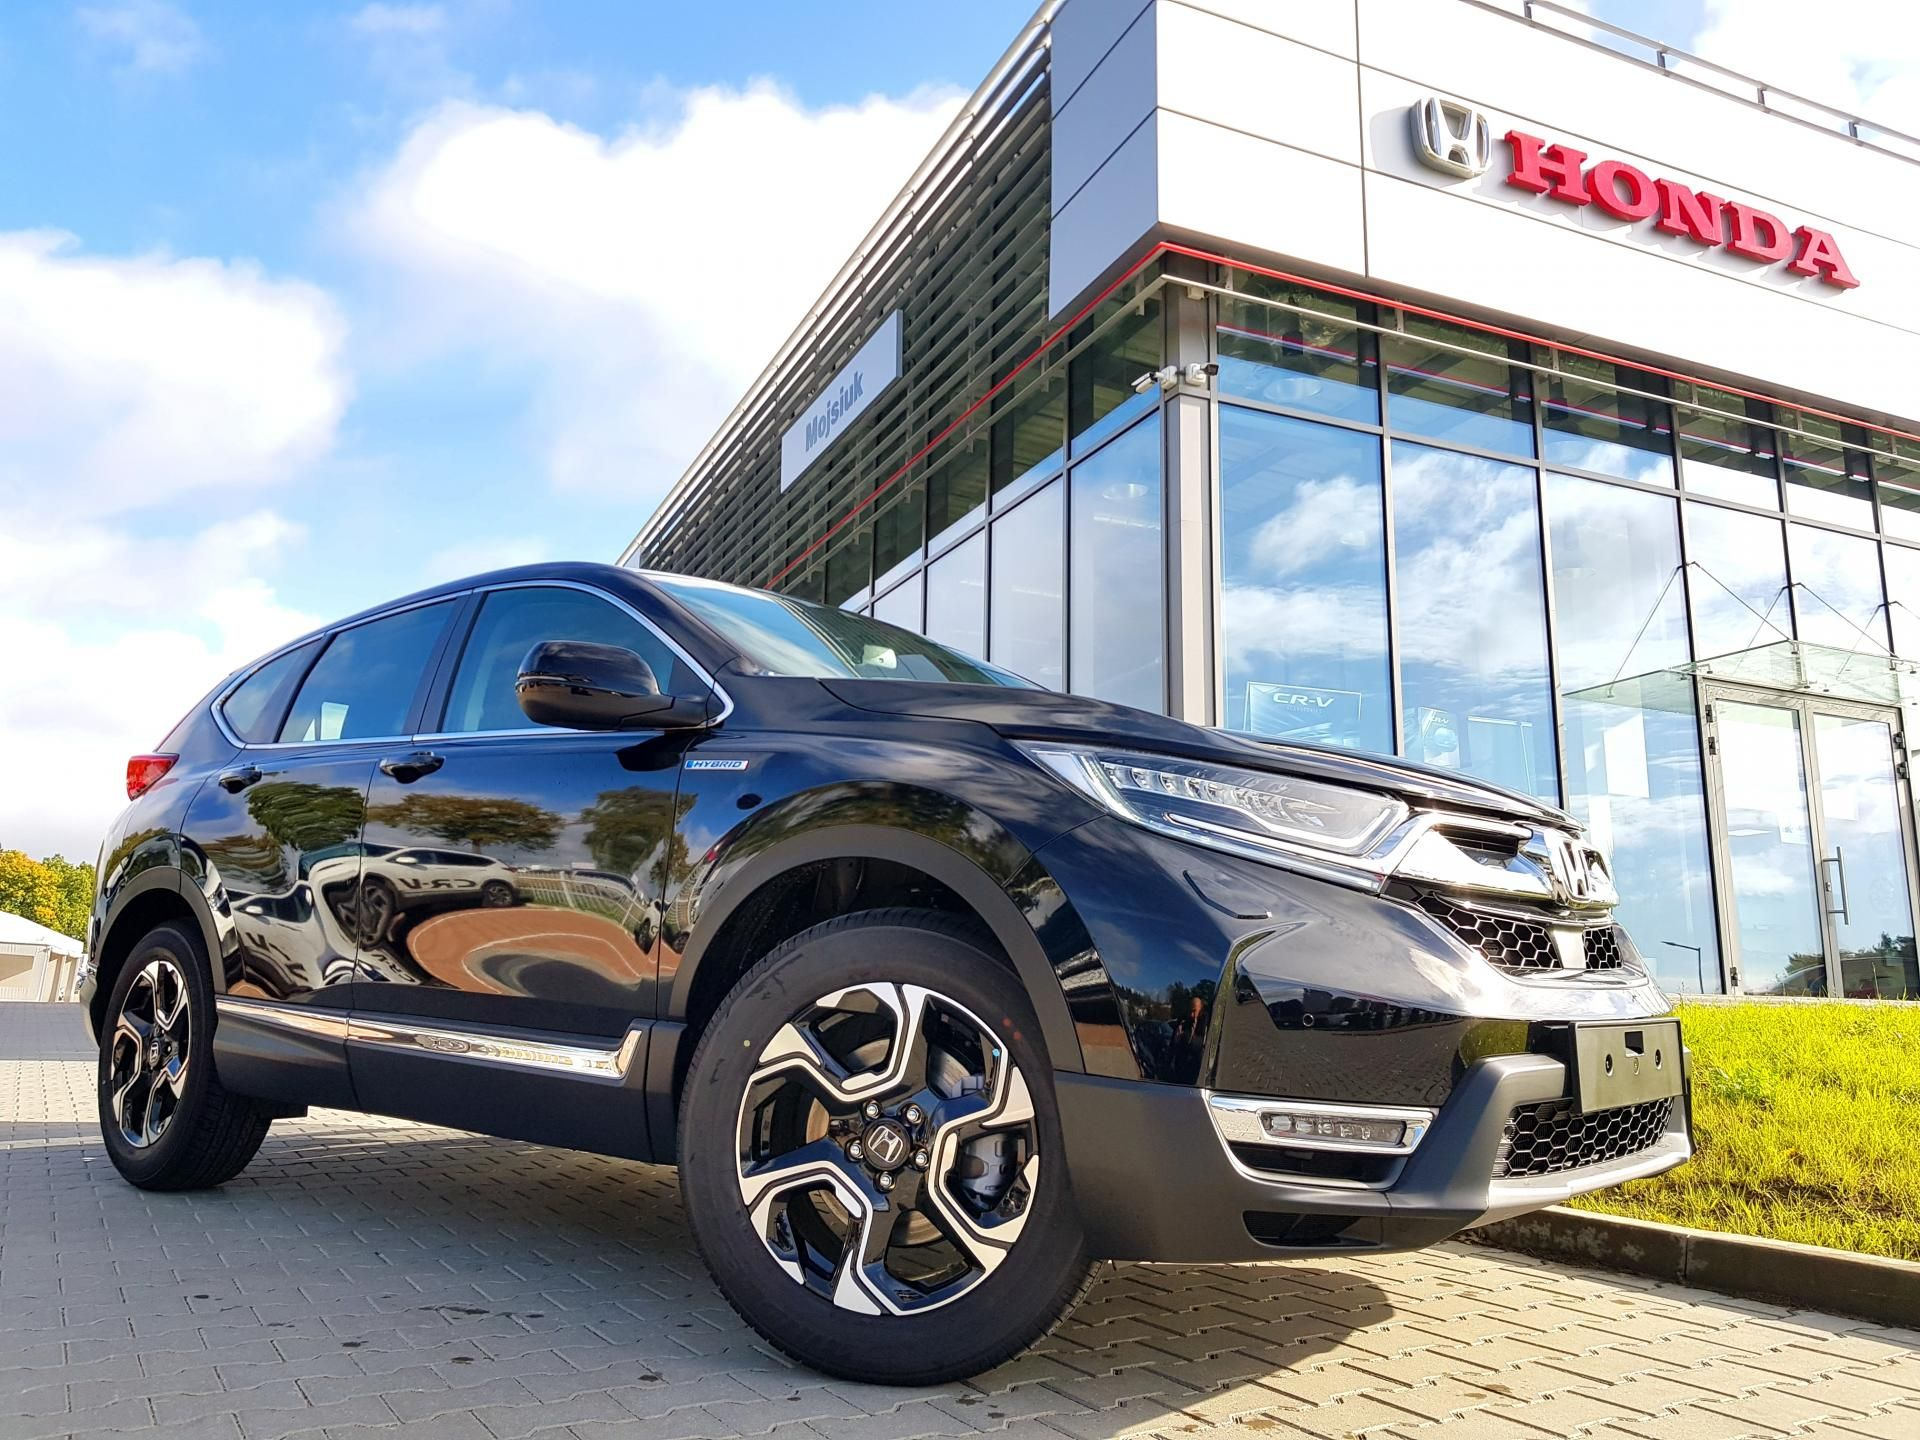 Honda CR-V 1.5 Elegance 2WD HYBRID e-CVT 2020  RABAT 20 000,-